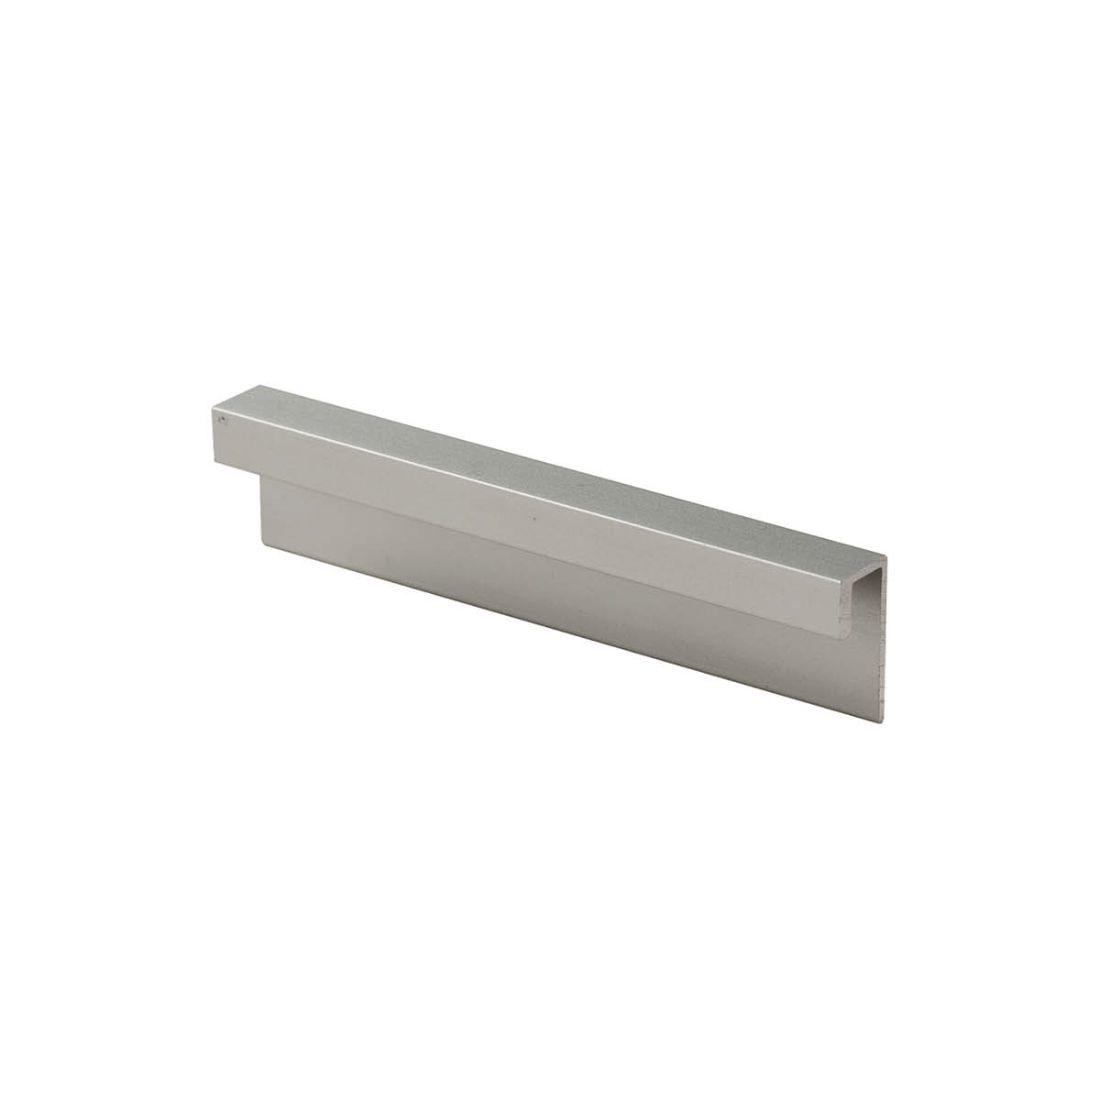 Aluminium End Cap Polar White 2700 x 4.5mm